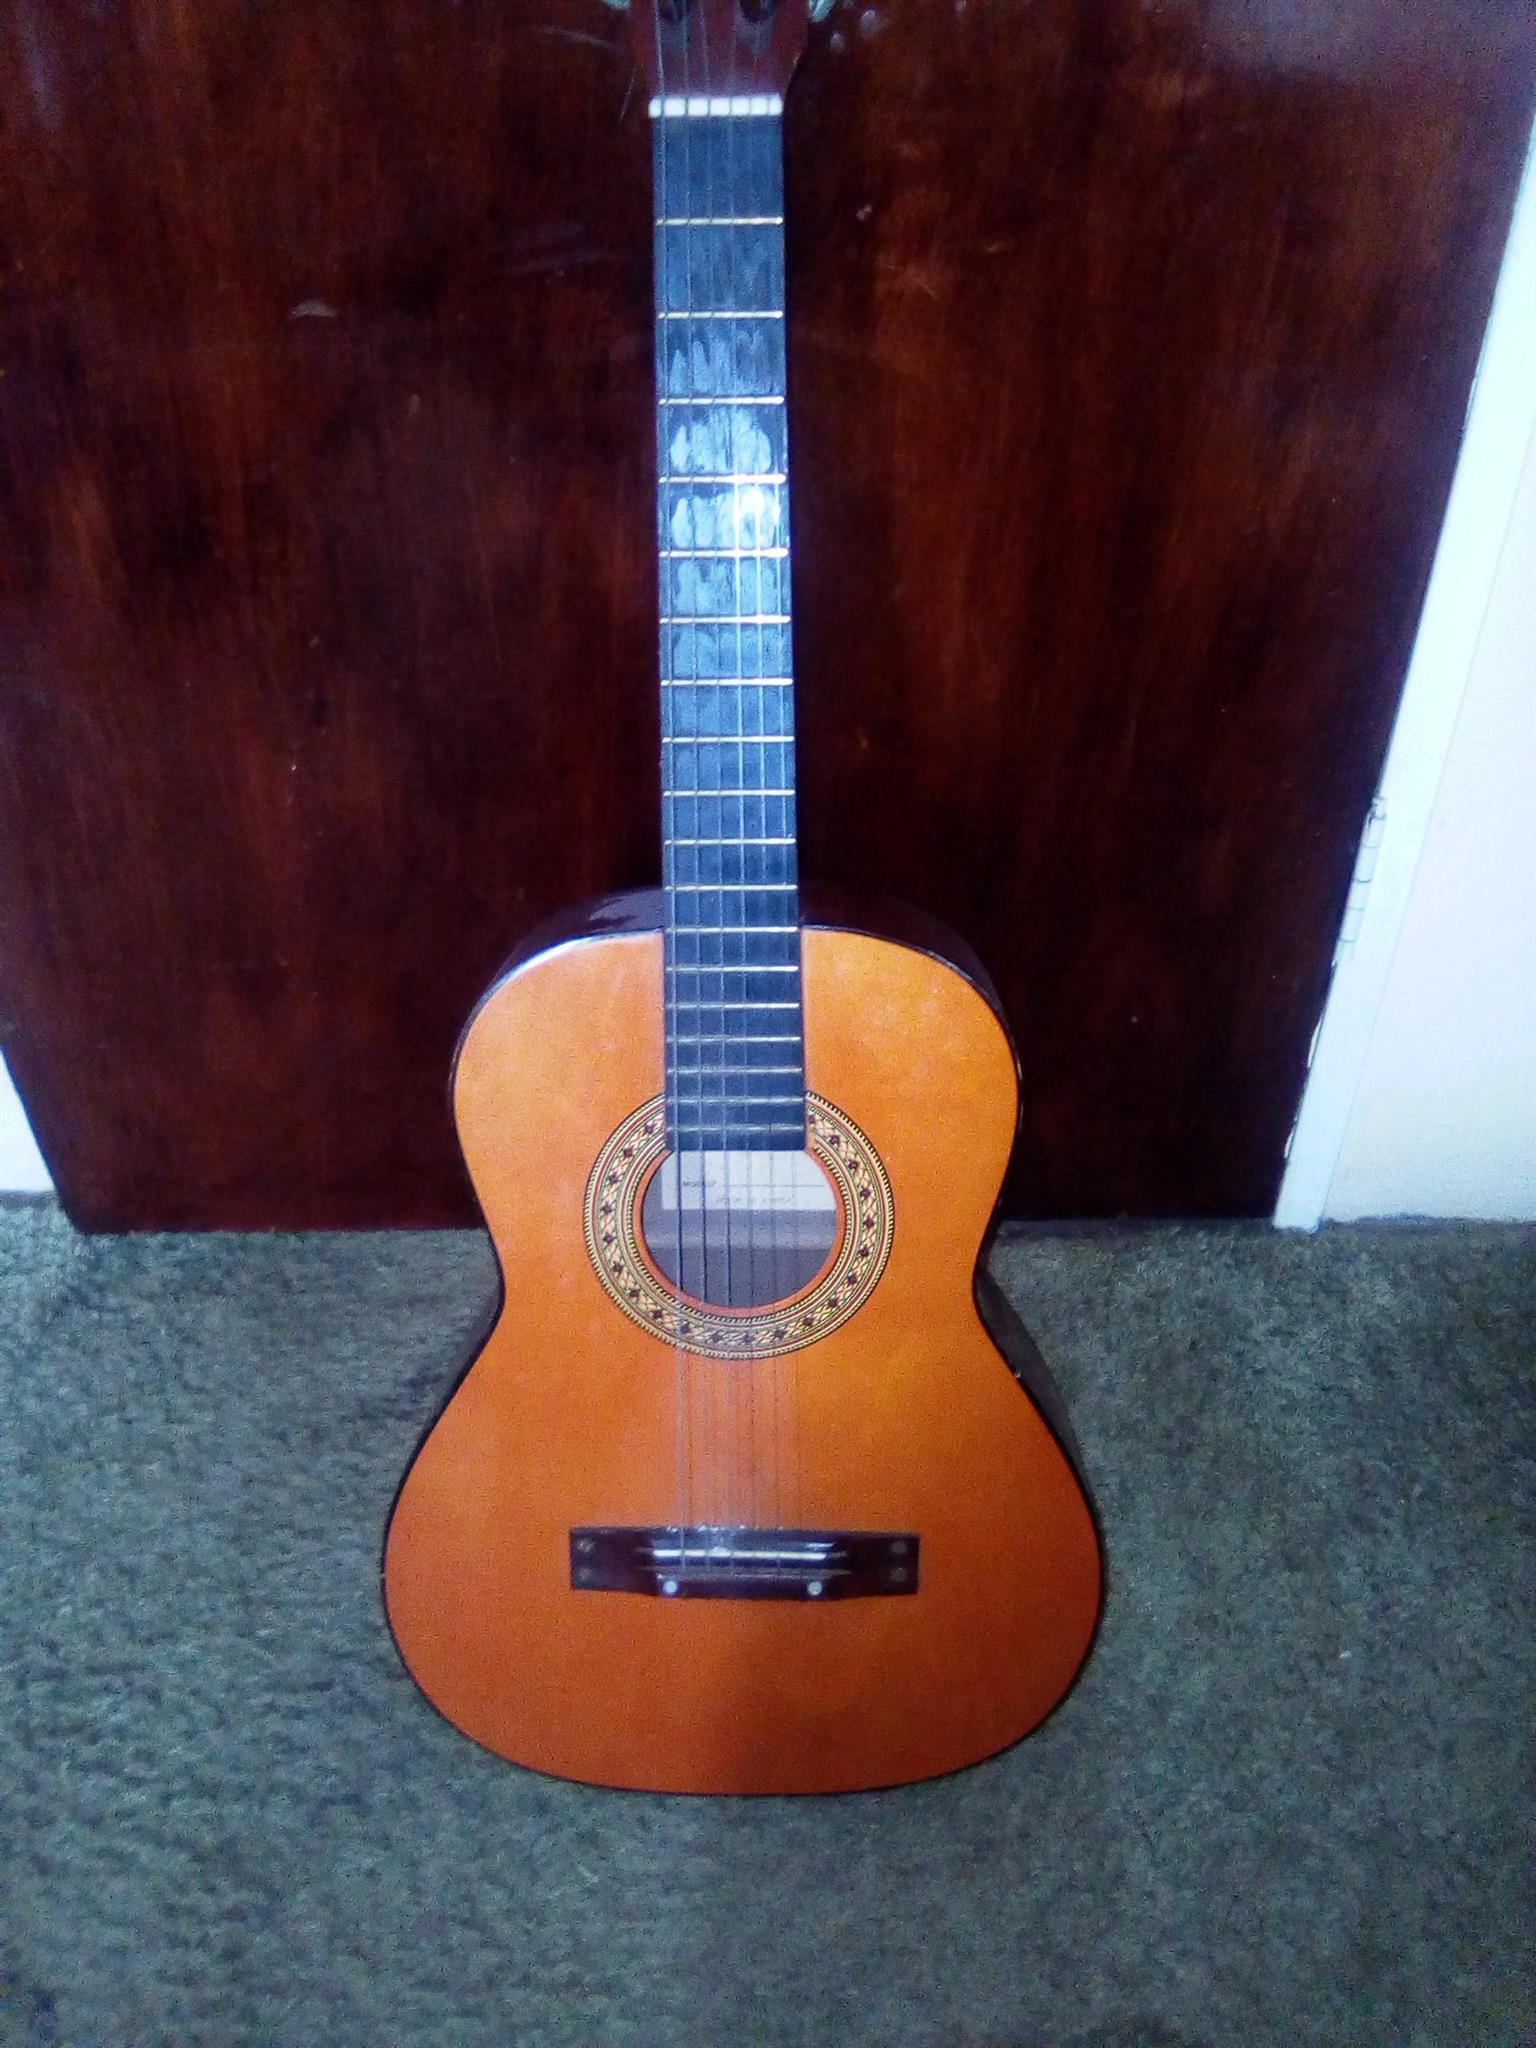 Antique nylon string, classical guitar